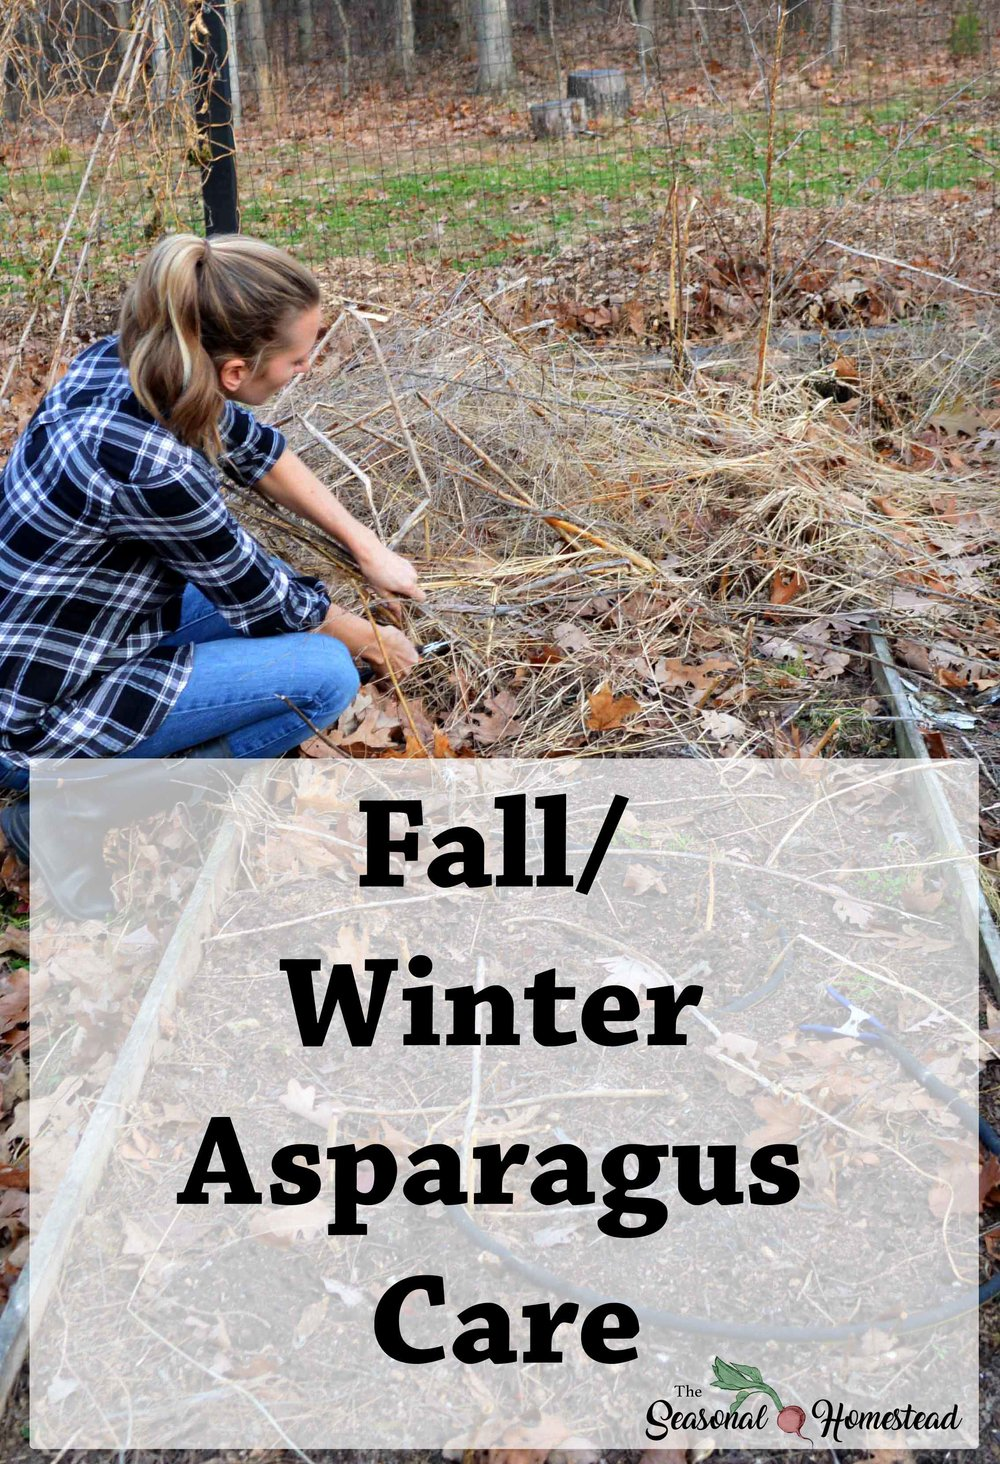 Fall-winter-asparagus-care.jpg